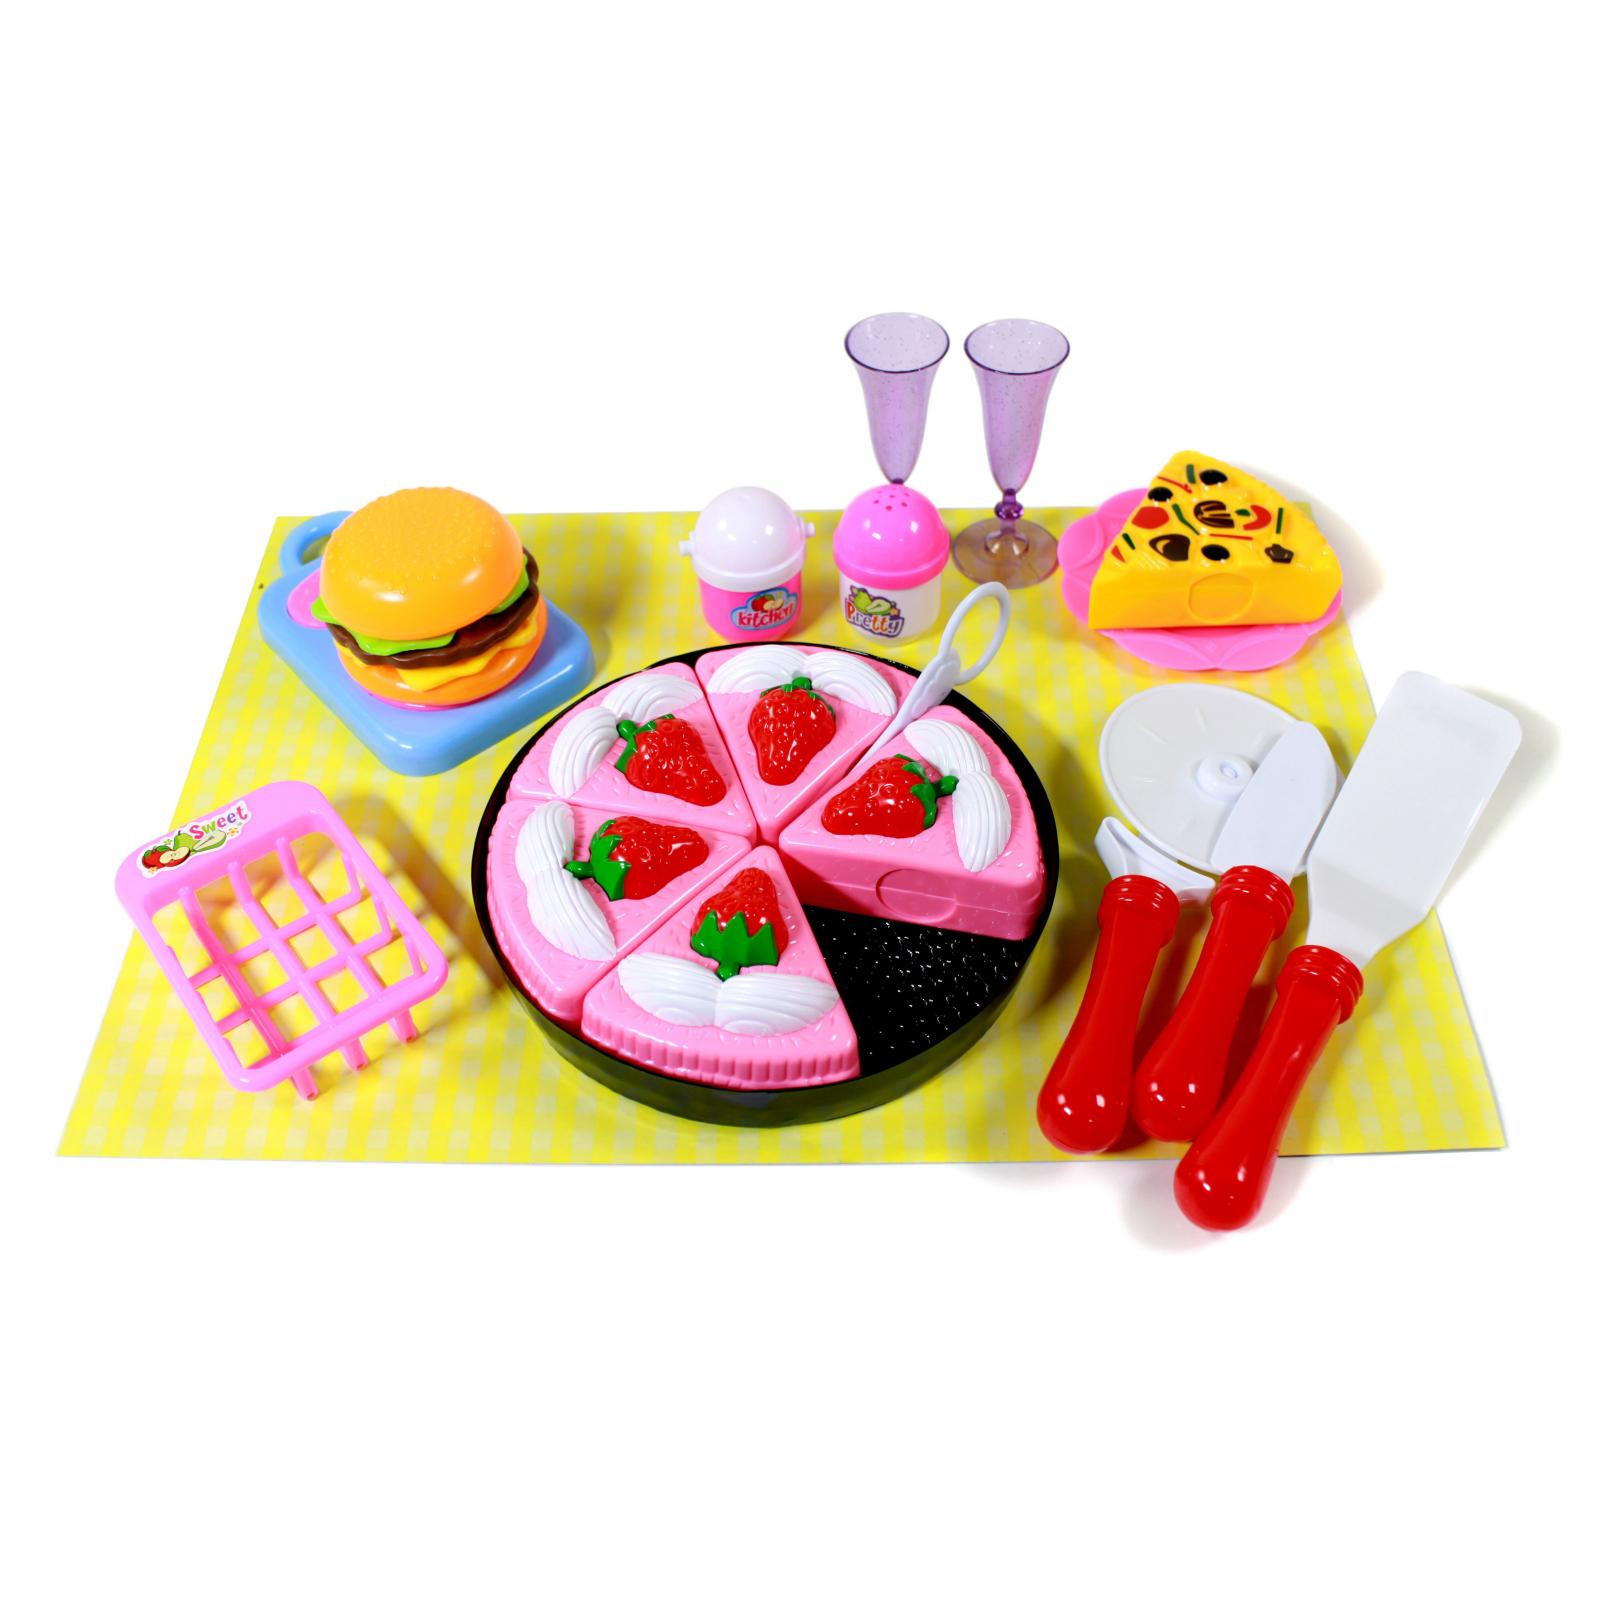 Kidfun Pretend Play Kitchen Playhouse Chef Set - Cake